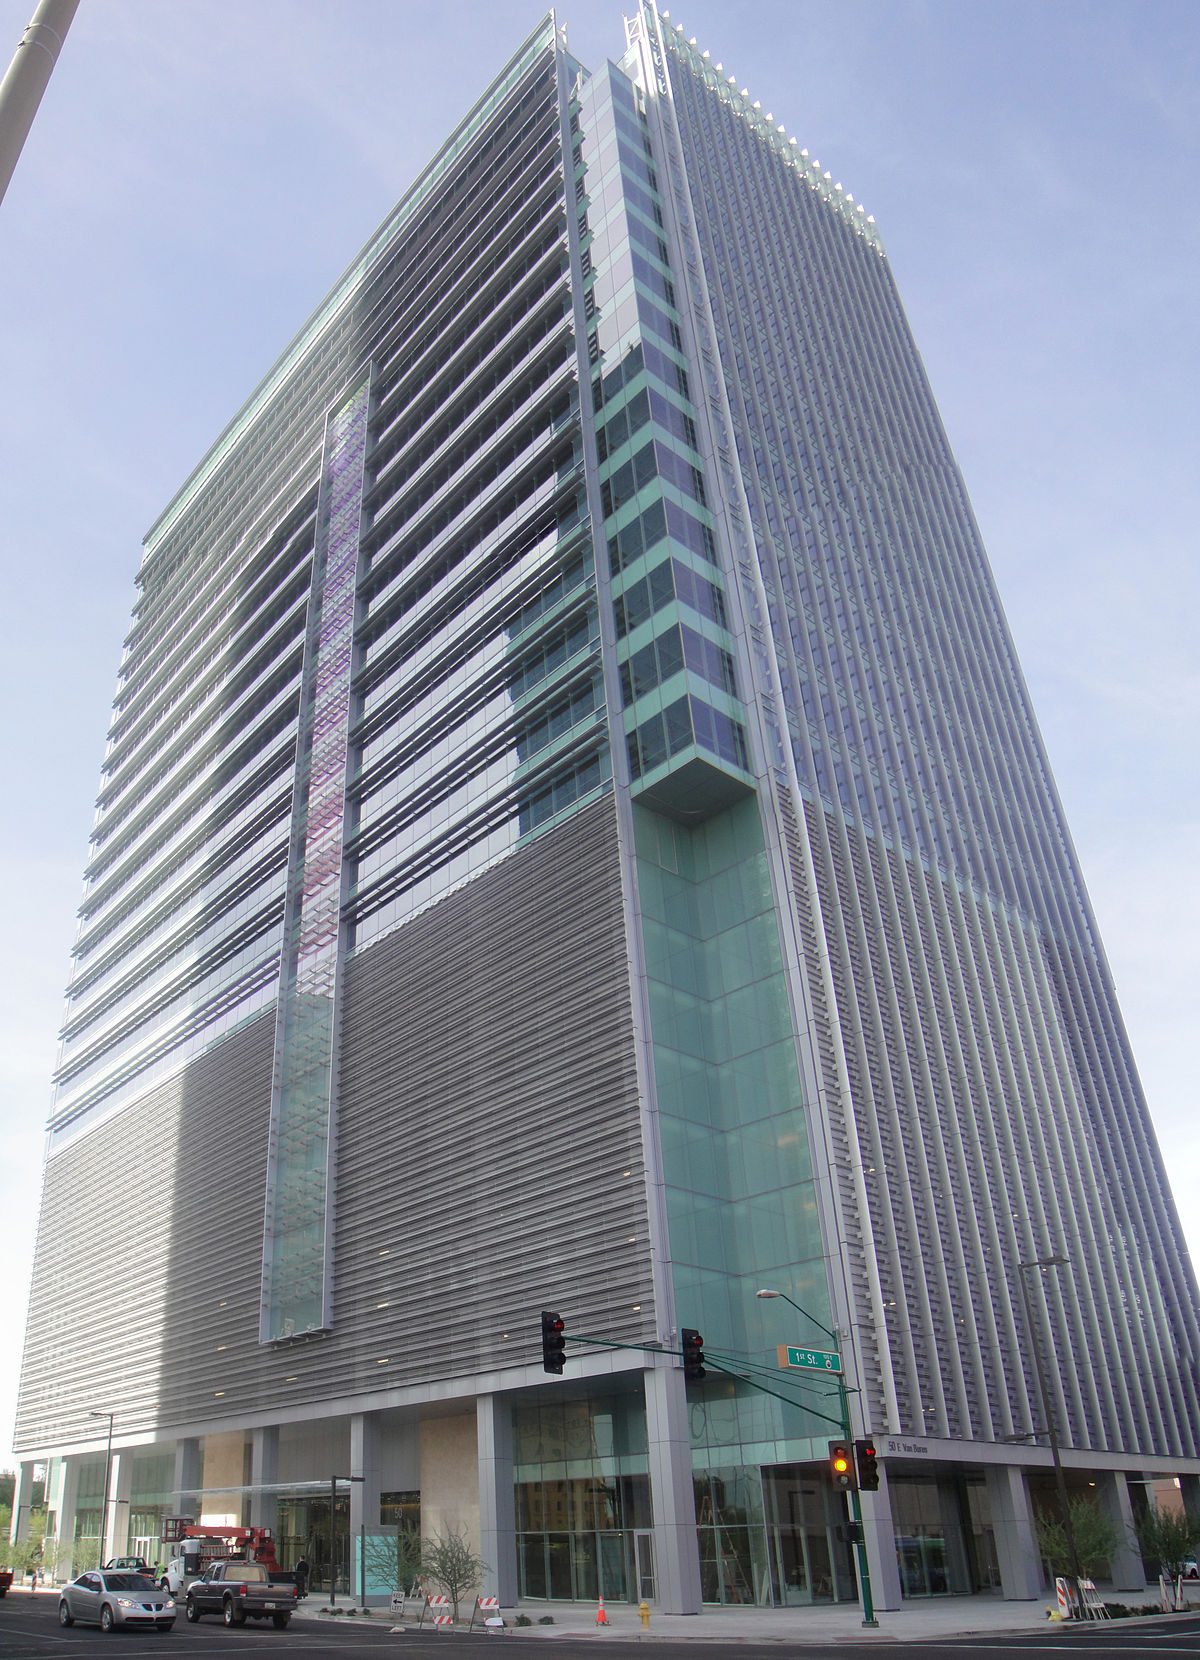 Freeport McMoRan Center Wikipedia